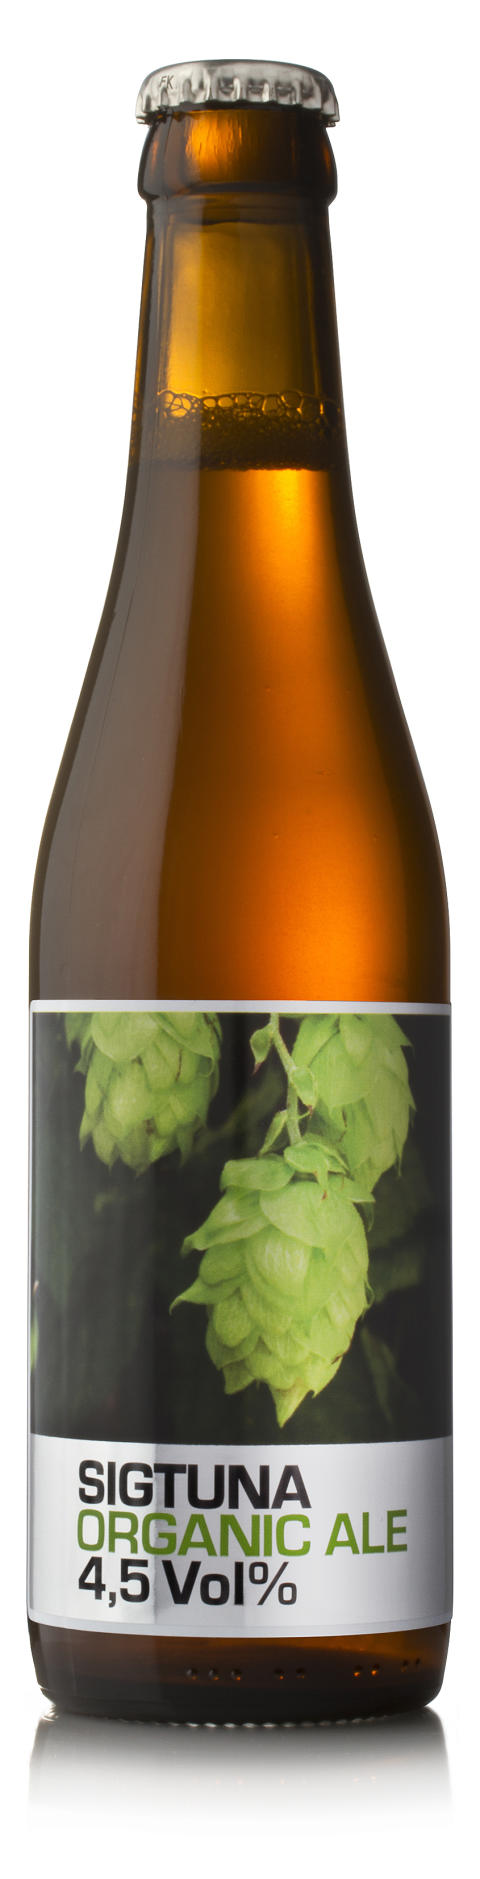 Sigtuna Organic Ale